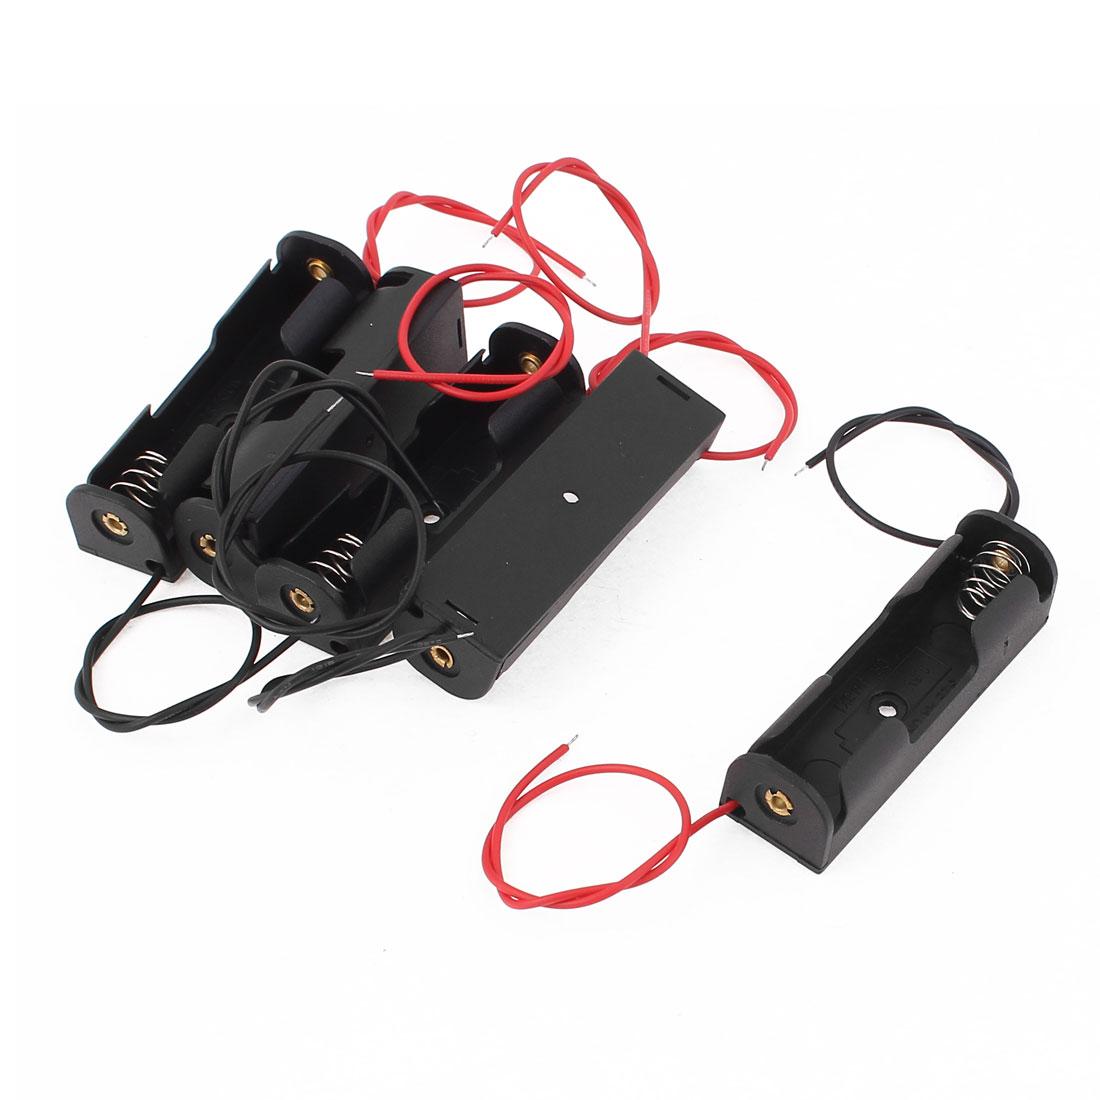 5pcs Spring Clip Plastic 1 x 1.5V AA Battery Case Holder Black